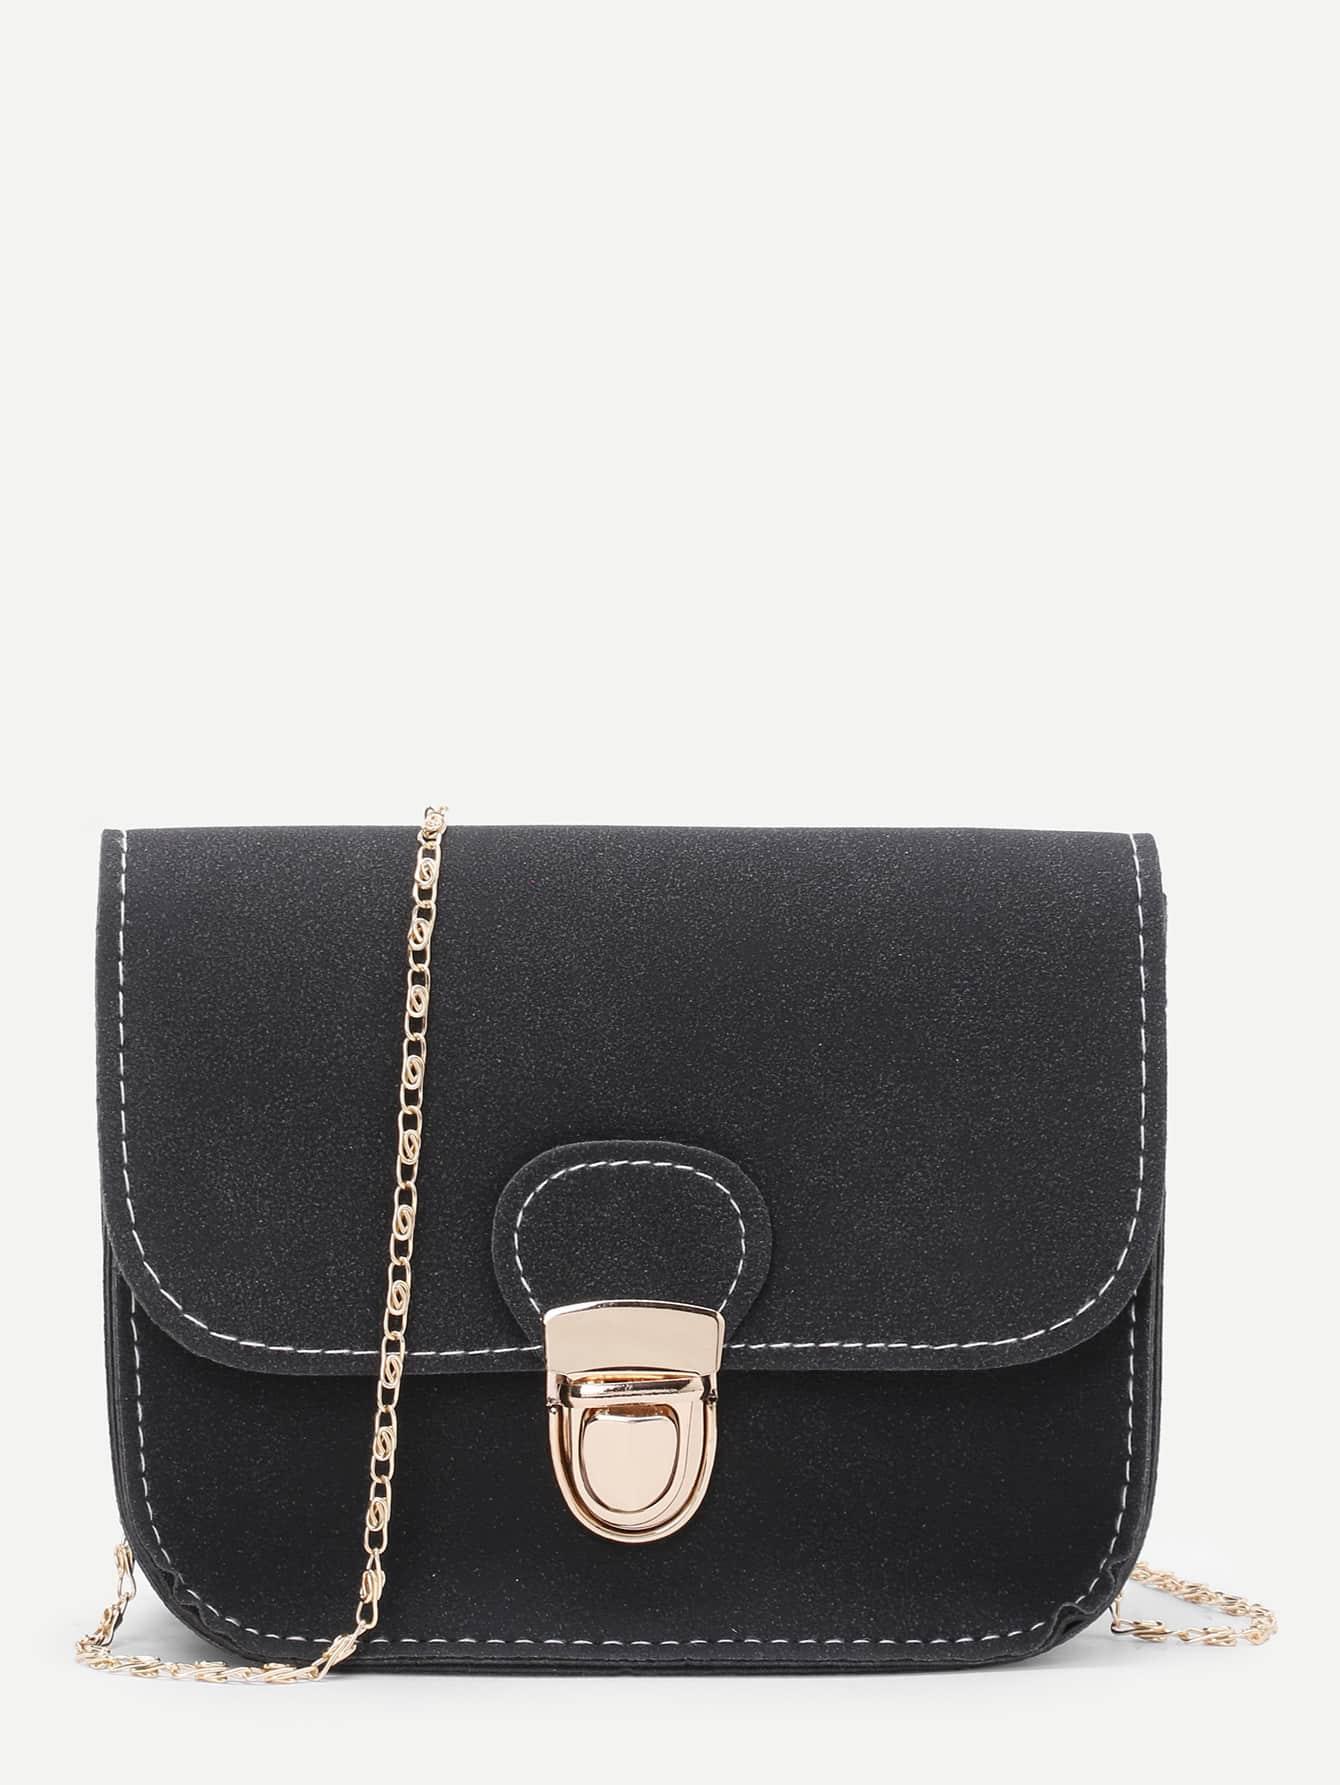 Pushlock Flap Chain Bag все цены